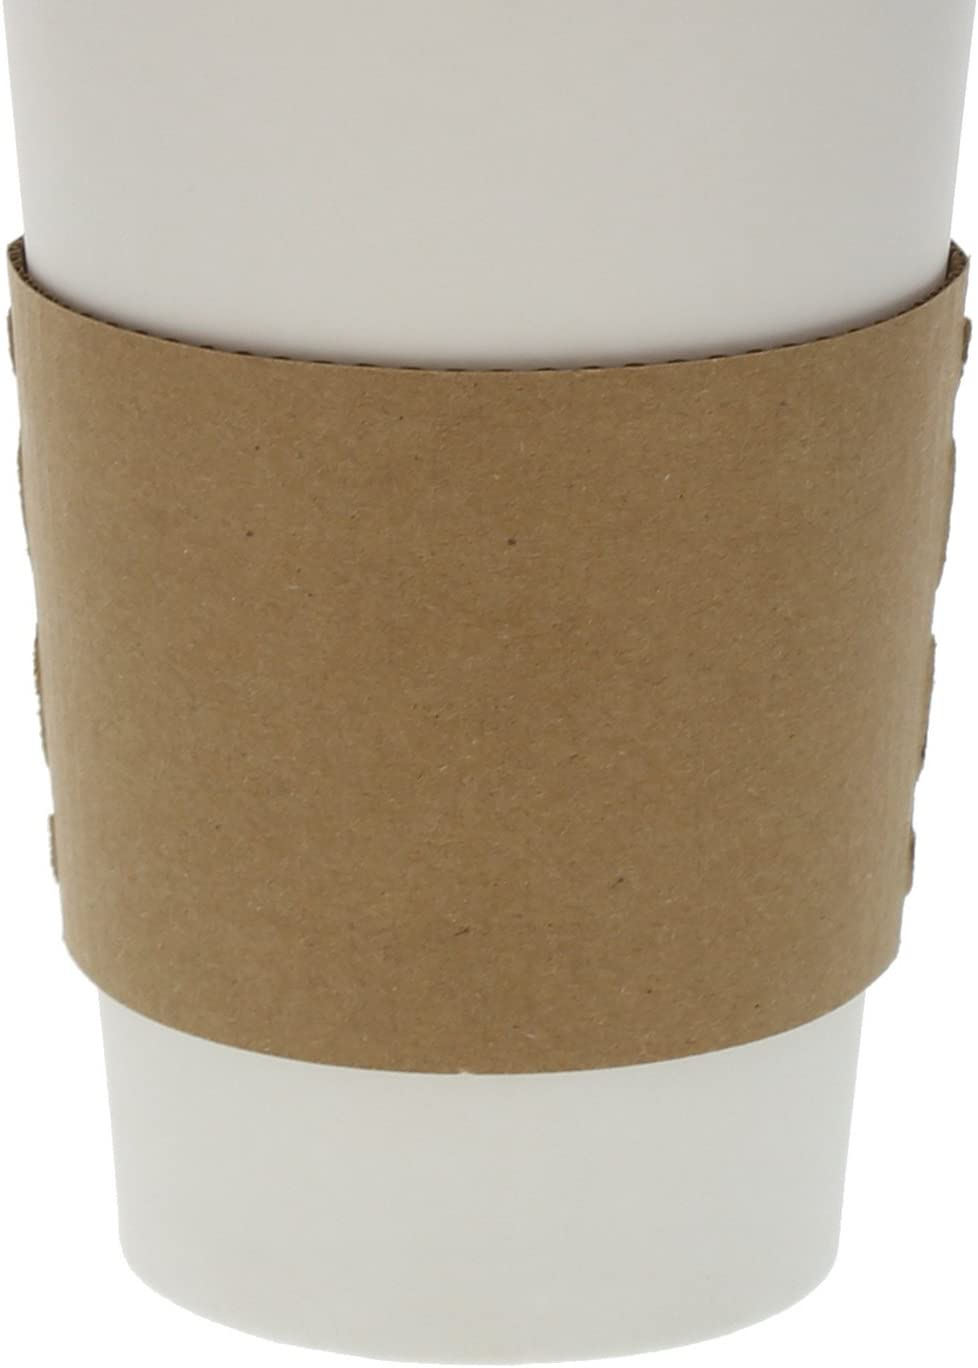 Envirolines Disposable Kraft Paper Hot Coffee Cup Sleeves, Case of 1000